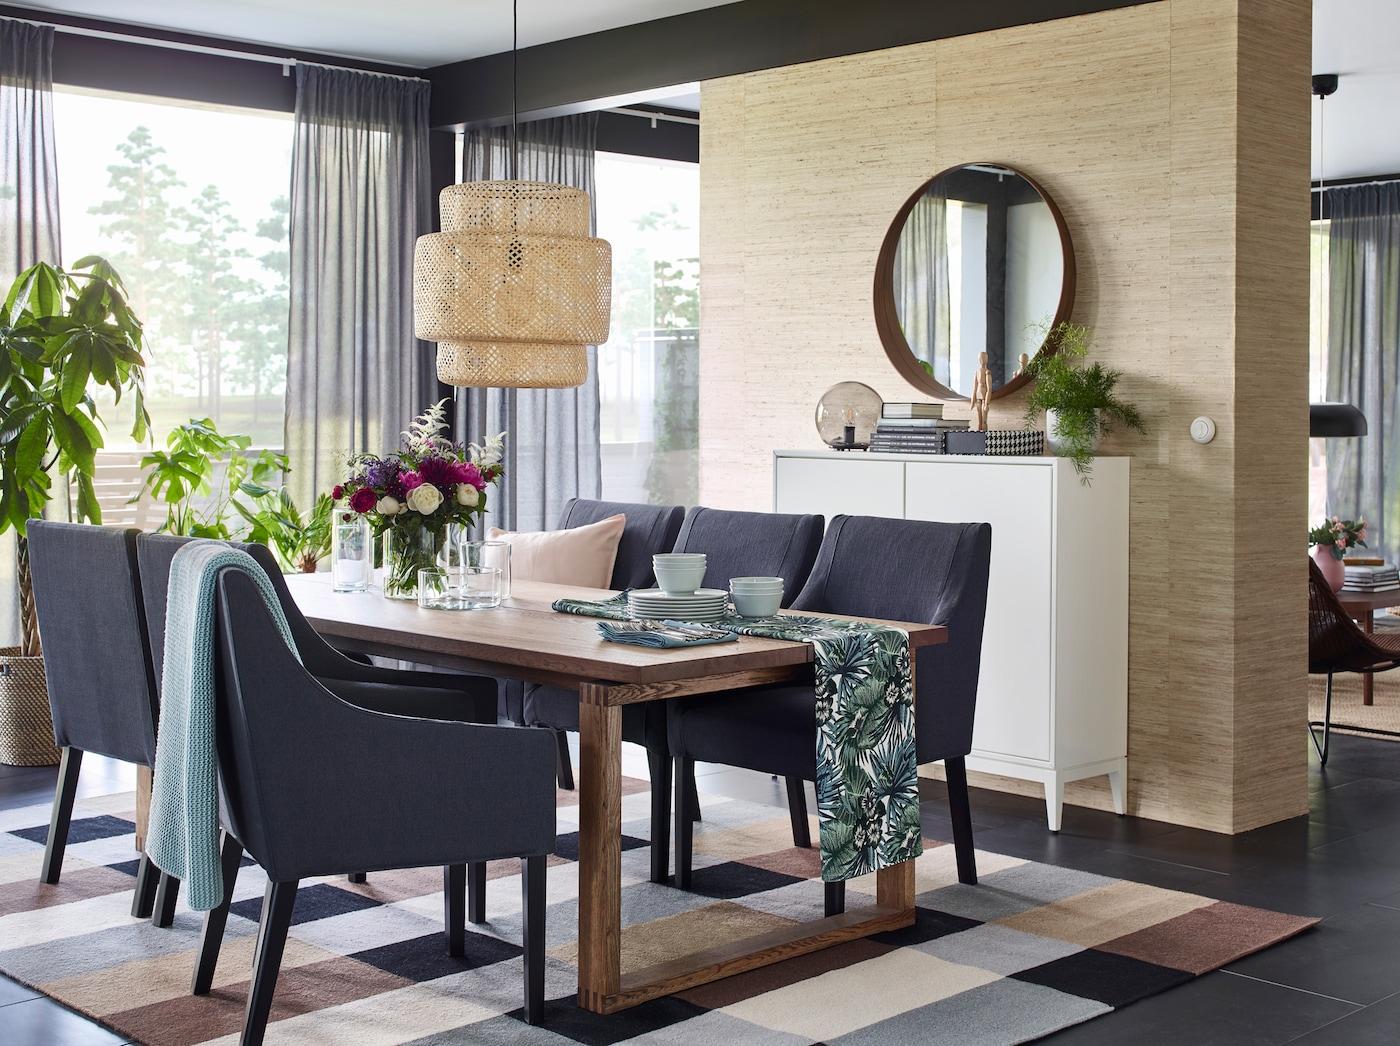 Ikea Sinnerlig Hanglamp : Fresh from the garden ikea